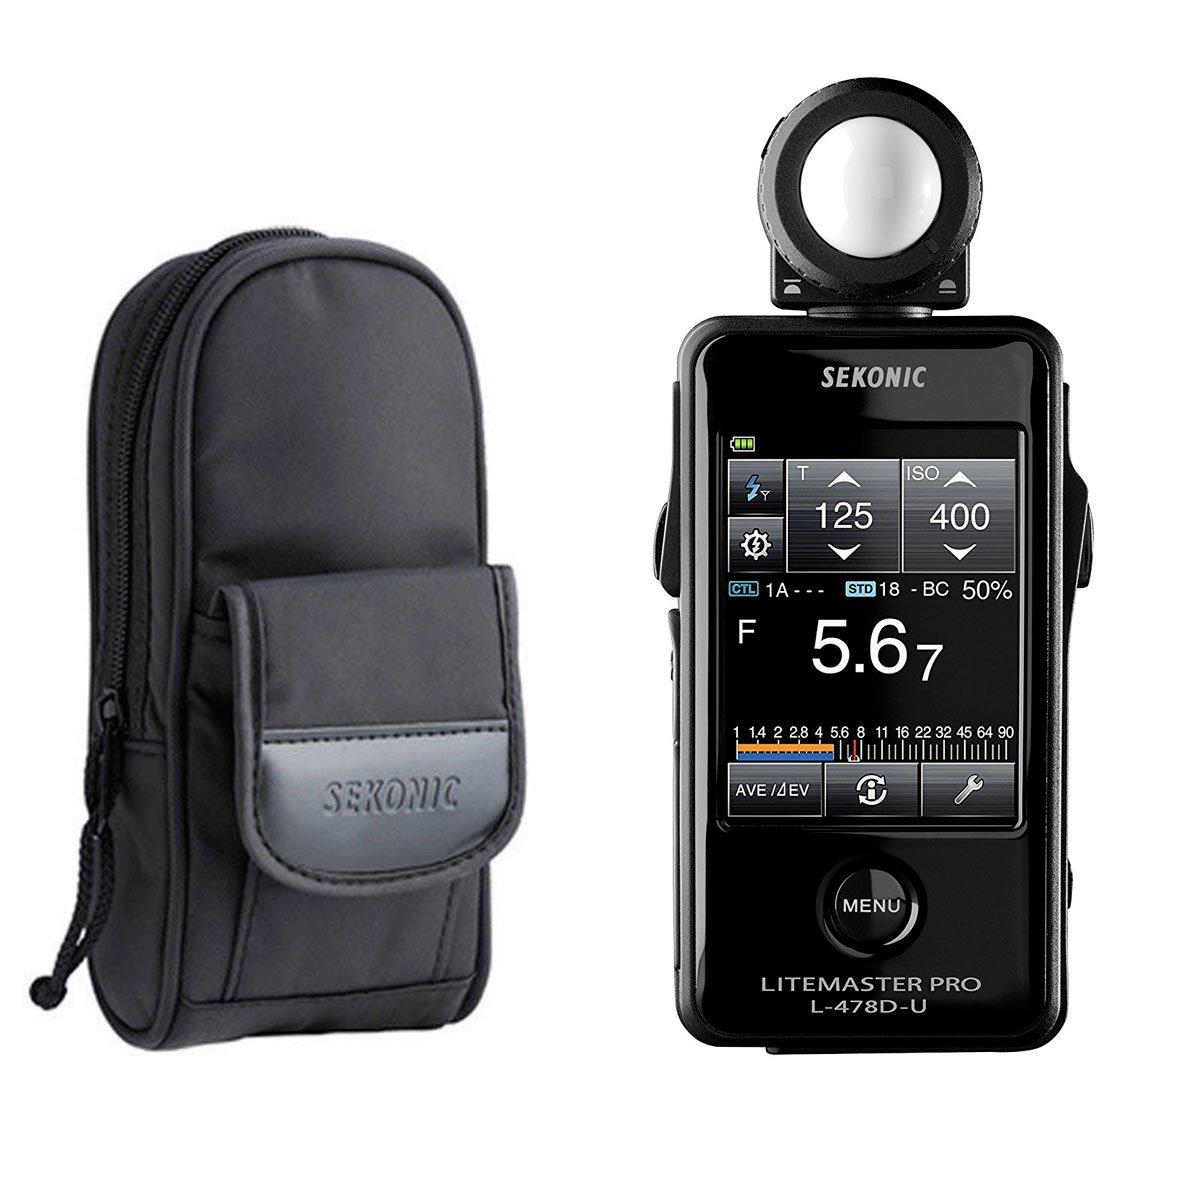 Sekonic LiteMaster Pro L-478D-U Light Meter With Exclusive 3-Year Warranty + Sekonic Deluxe Case for L-478-series meters by Sekonic